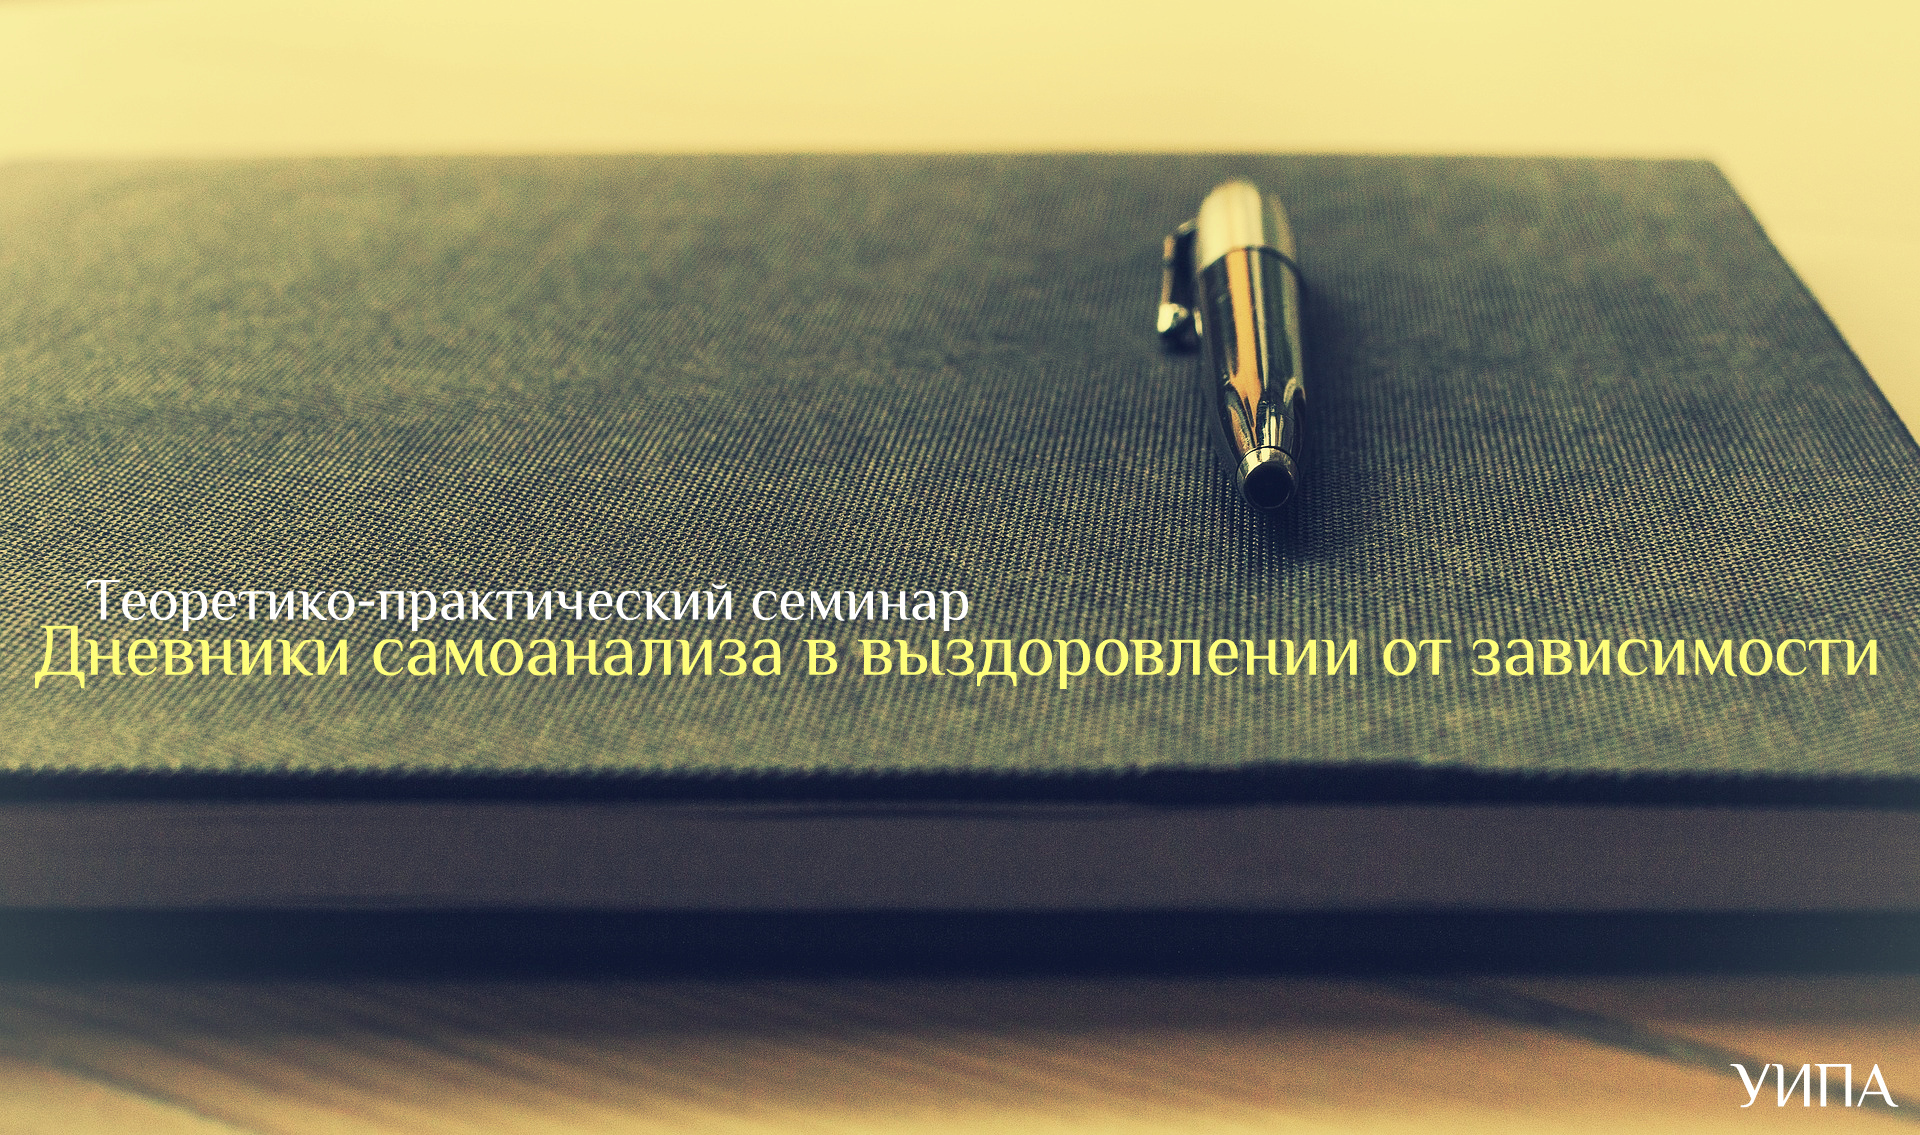 Дневники самоанализа